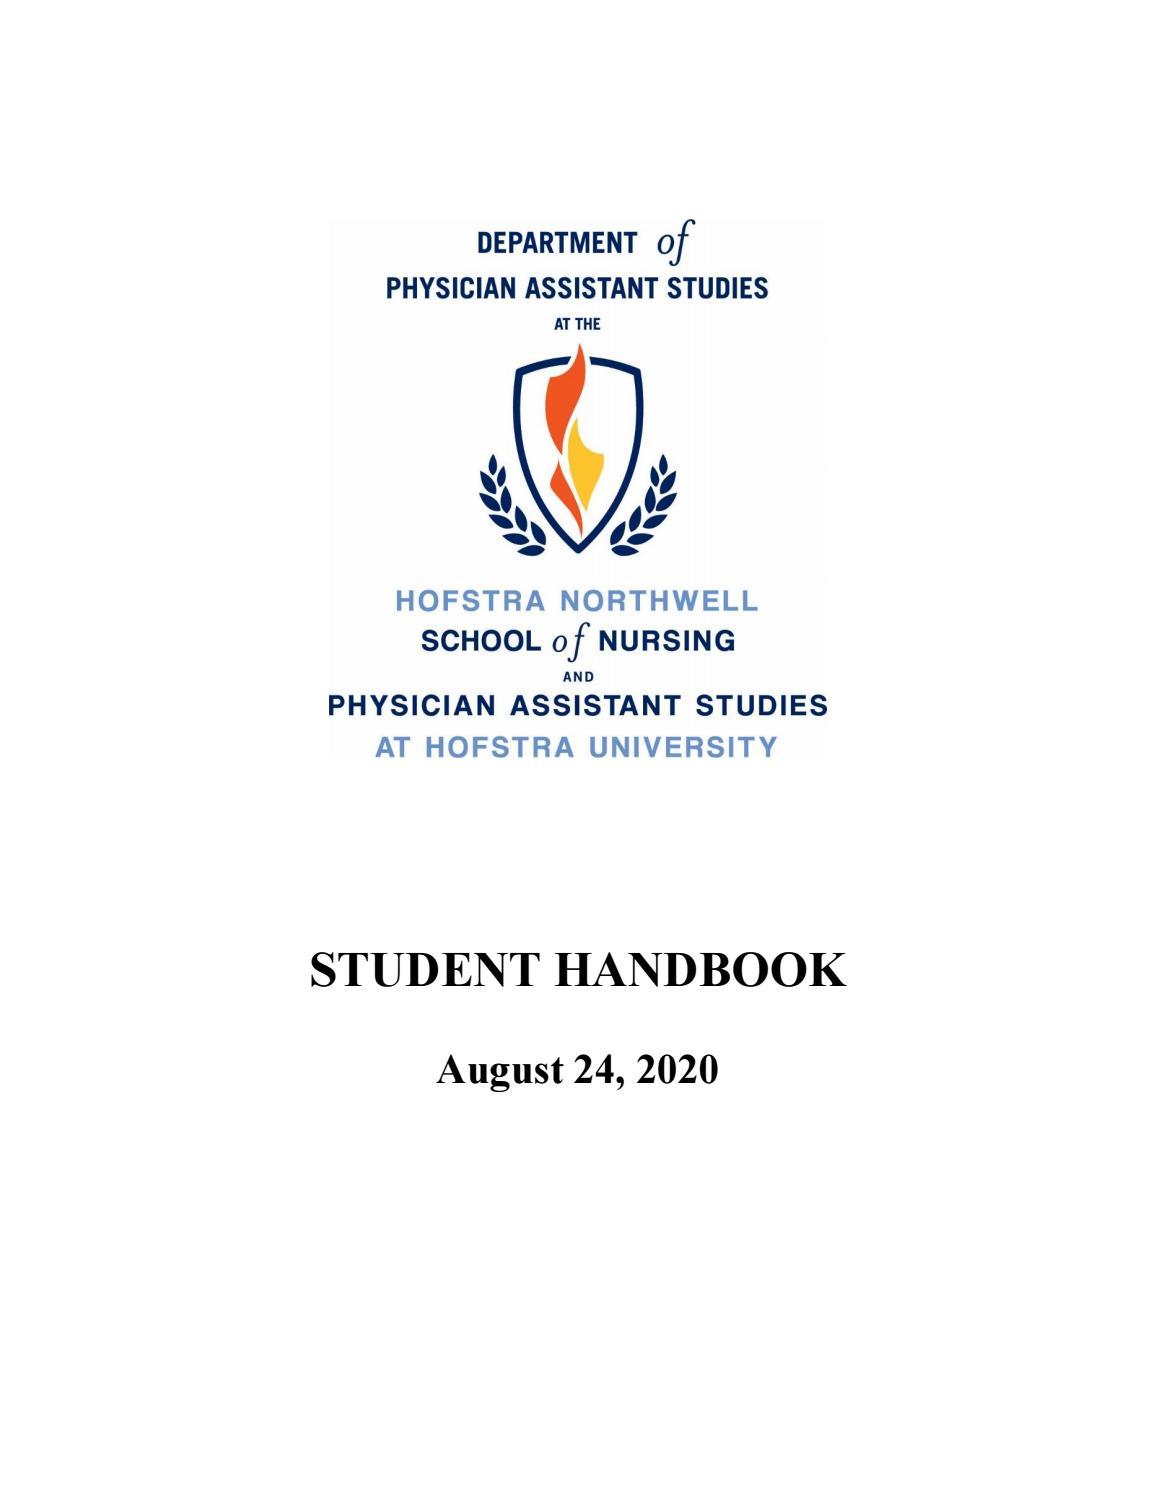 Hofstra Spring 2022 Calendar.School Of Nursing And Physician Assistant Studies At Hofstra University Student Handbook 08 24 2020 By Hofstra University Issuu